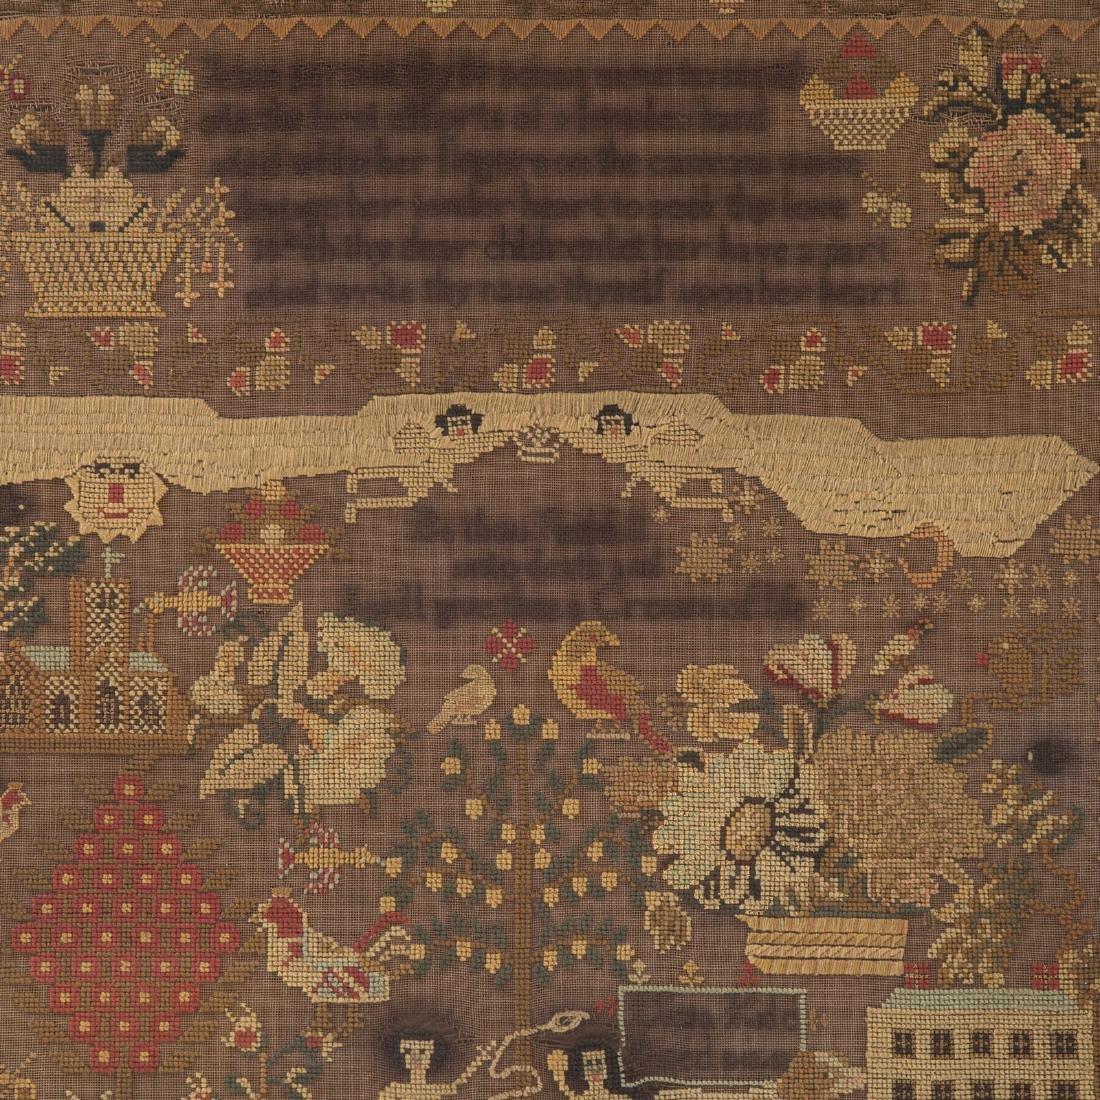 Eliza Kidd needlework sampler - 2